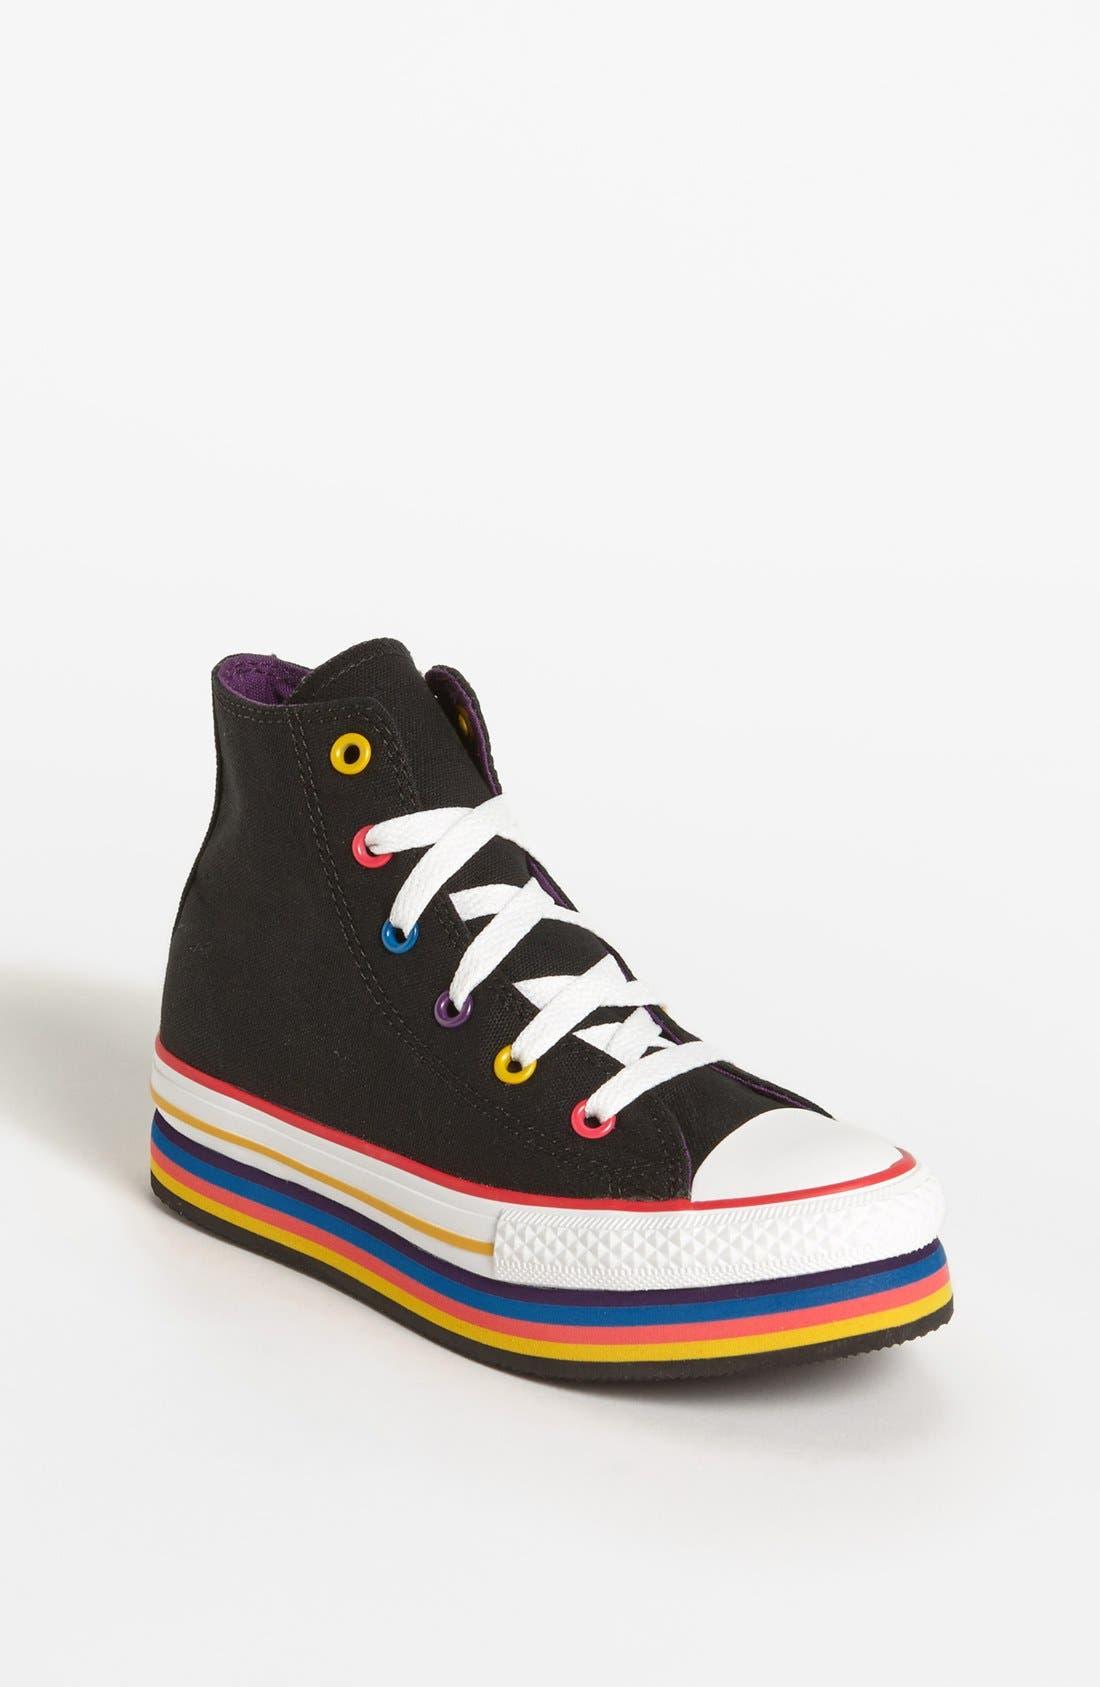 Alternate Image 1 Selected - Converse Chuck Taylor® All Star® Platform Sneaker (Toddler, Little Kid & Big Kid)